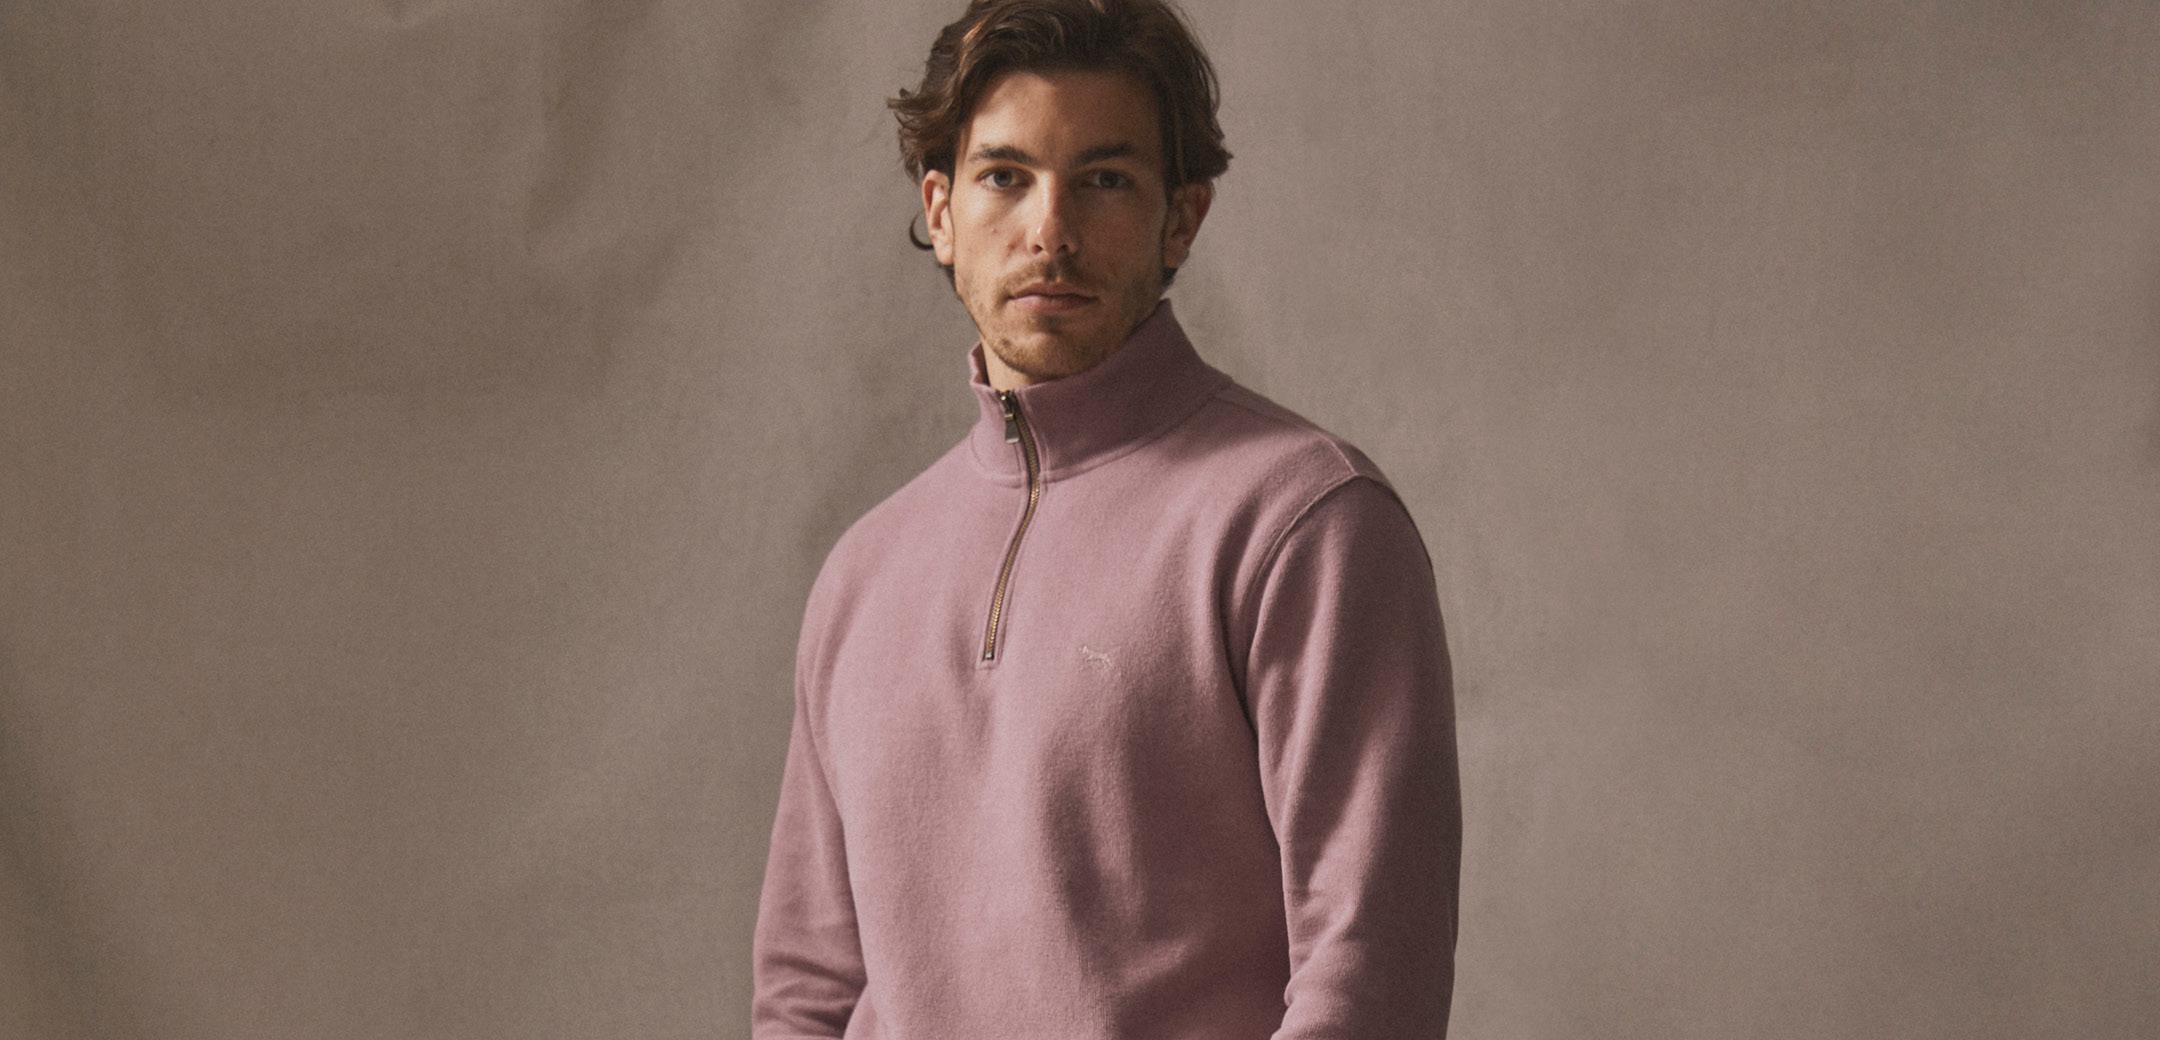 Gunn Zip Sweatshirts